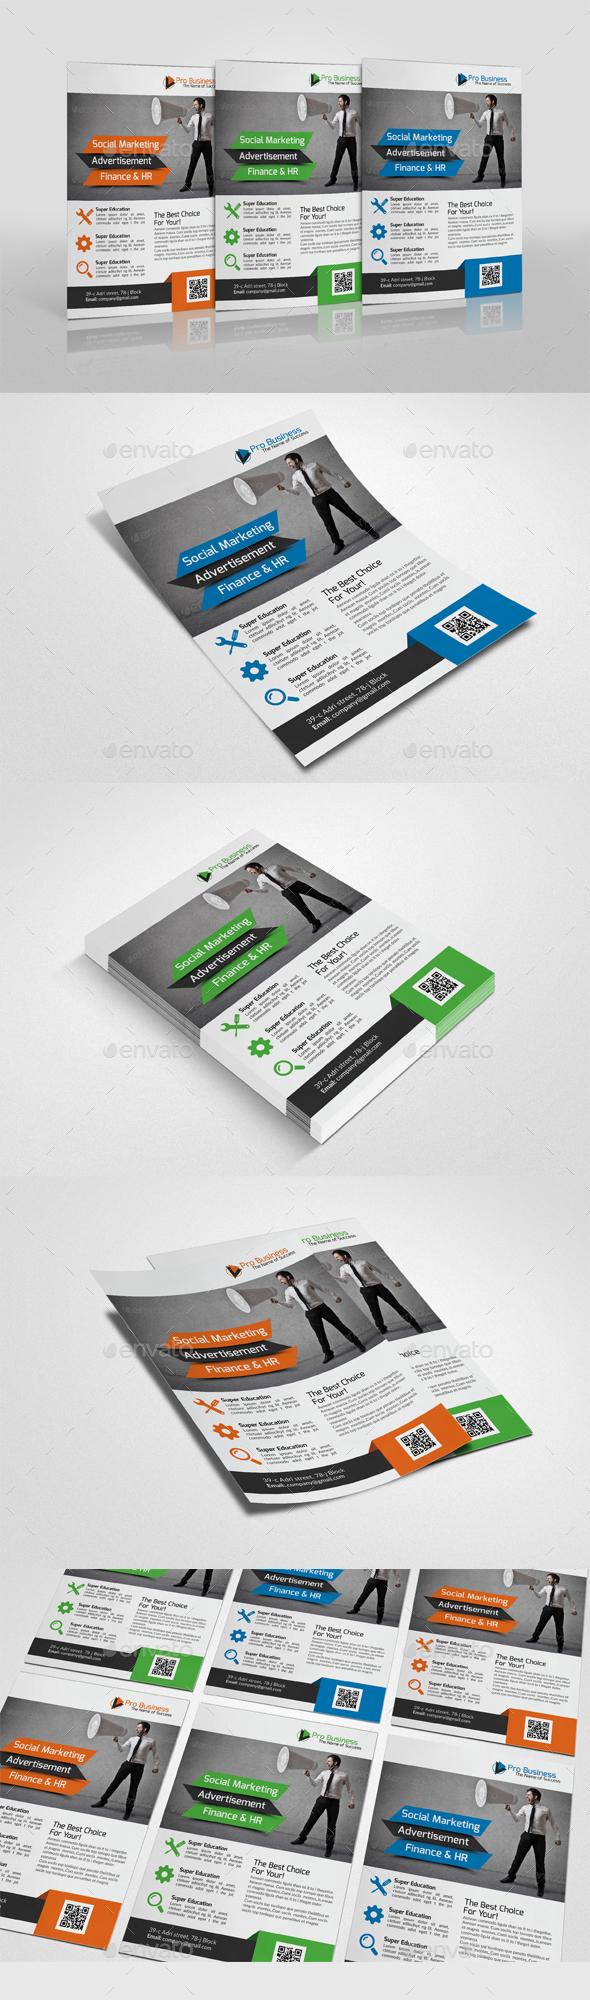 Multipurpose Business Flyer Template Psd Design Download Http